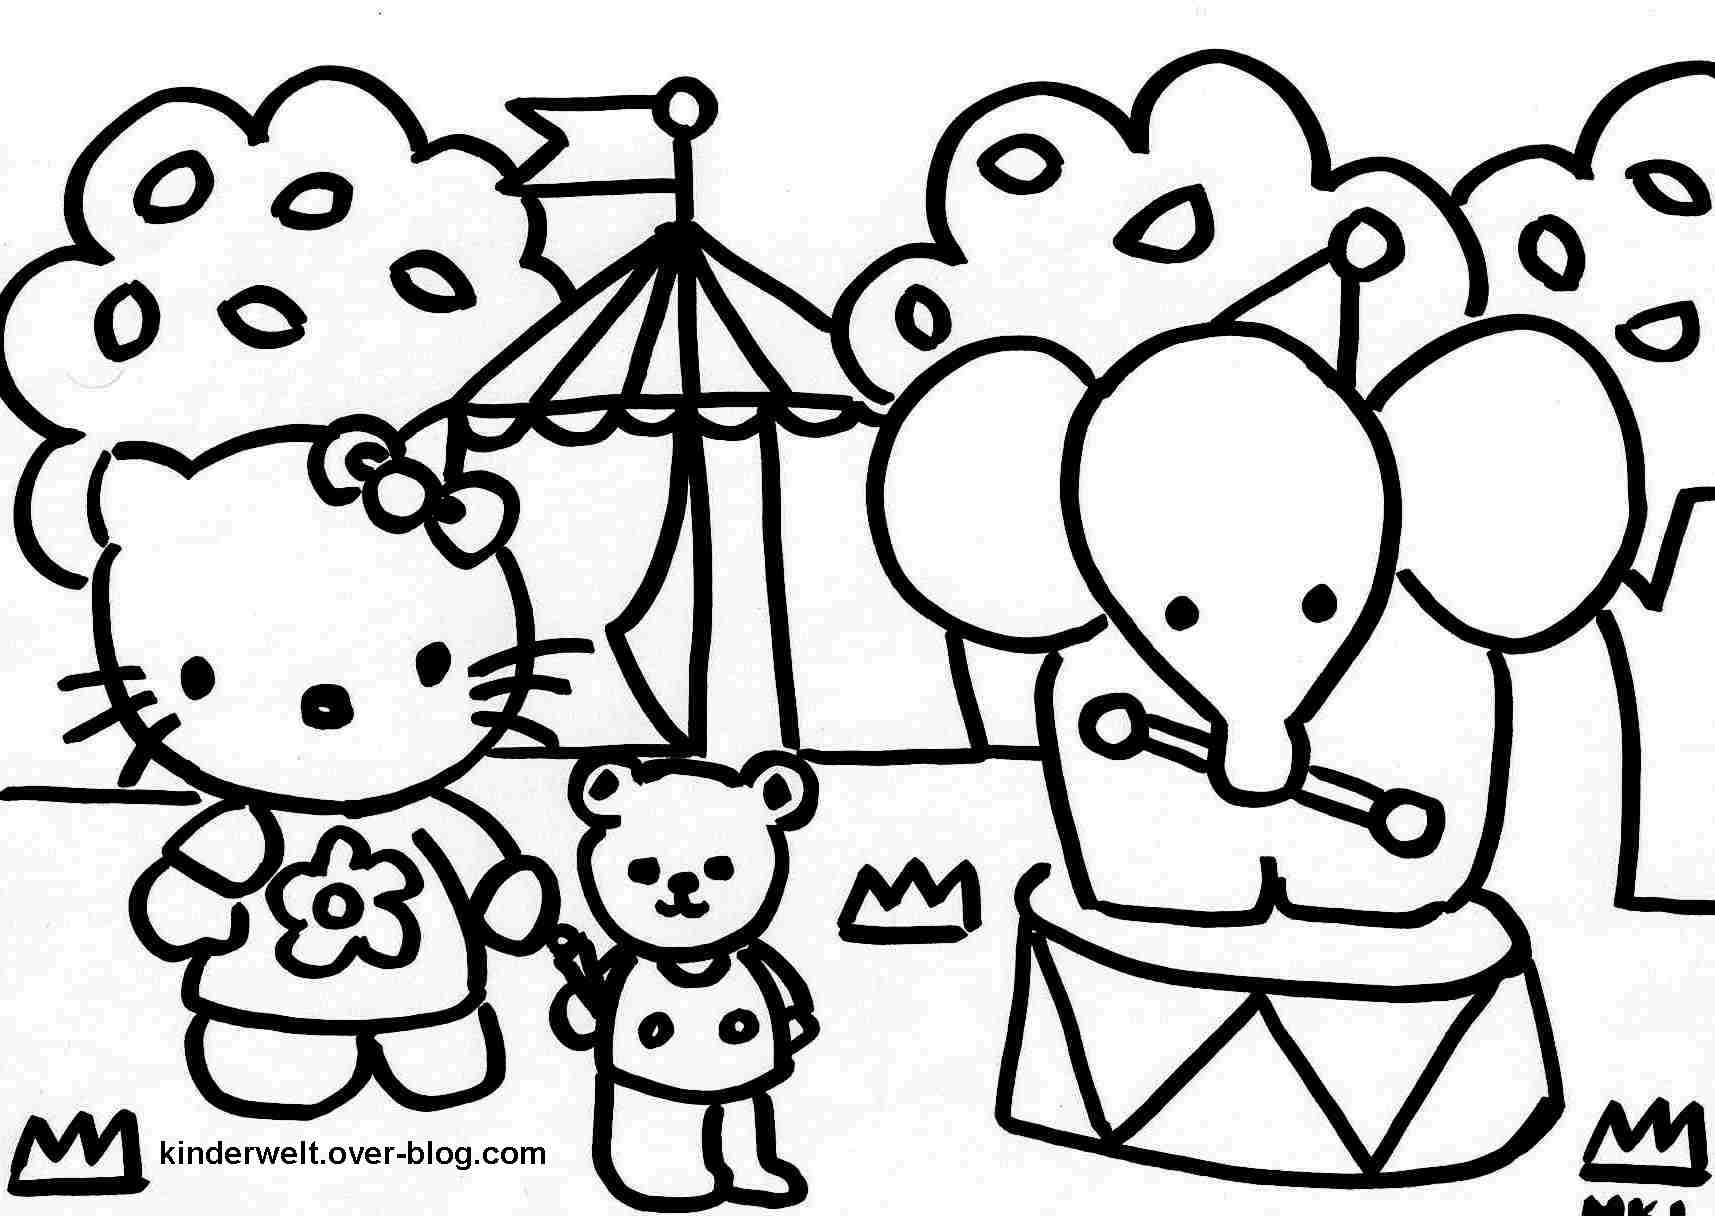 Beau Dessin Imprimer Hello Kitty Princesse